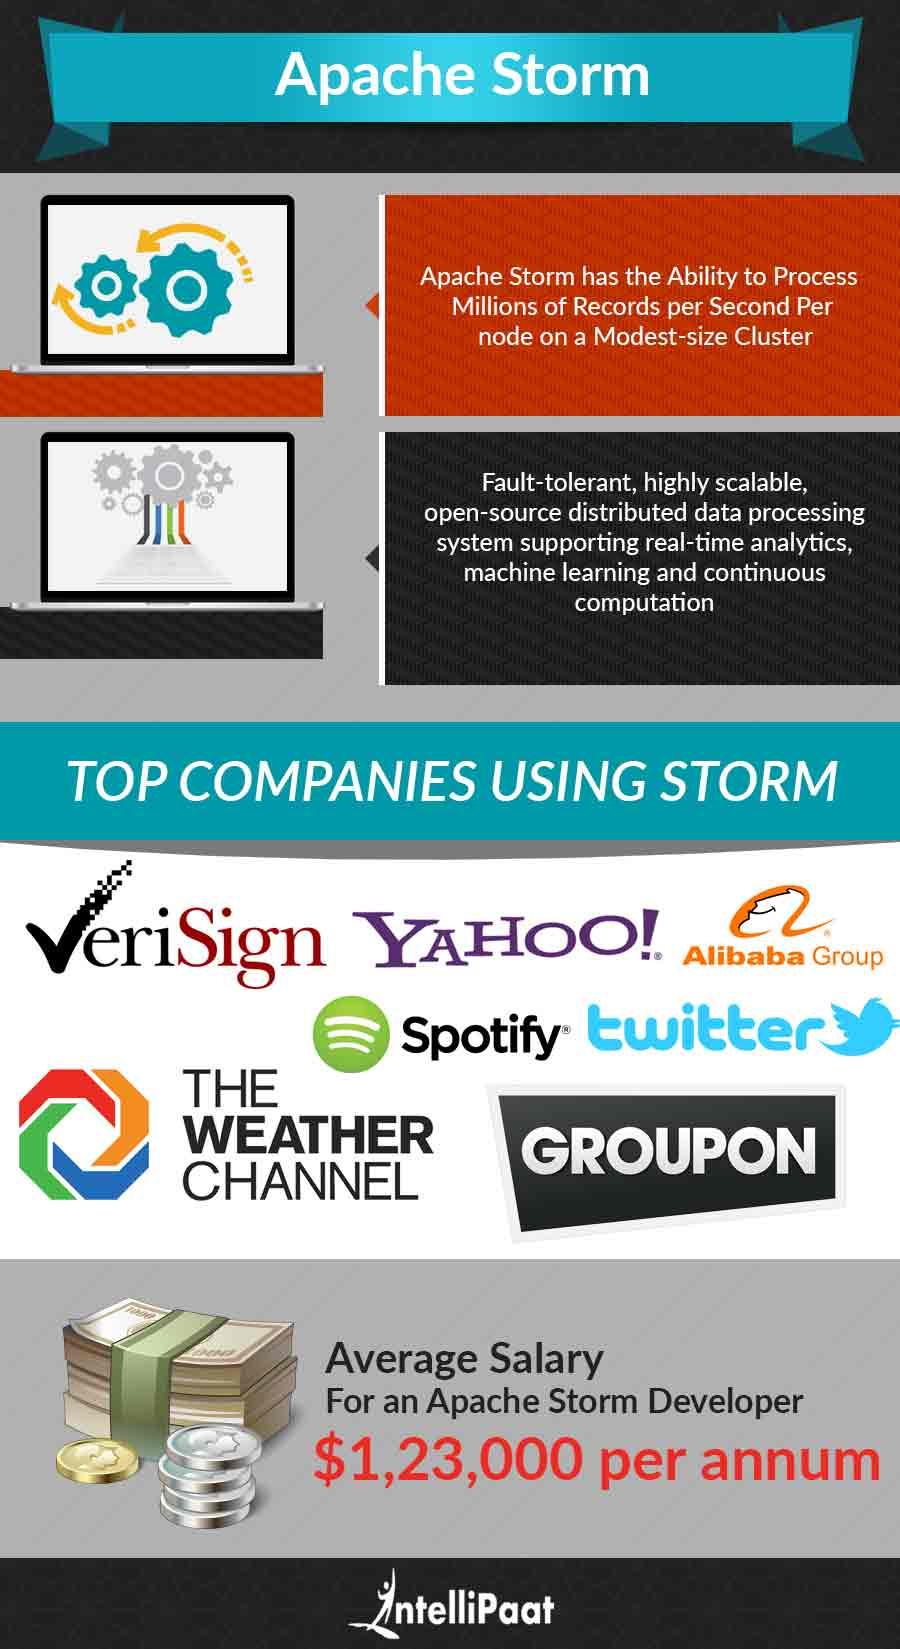 Apache-Storm-Infographic